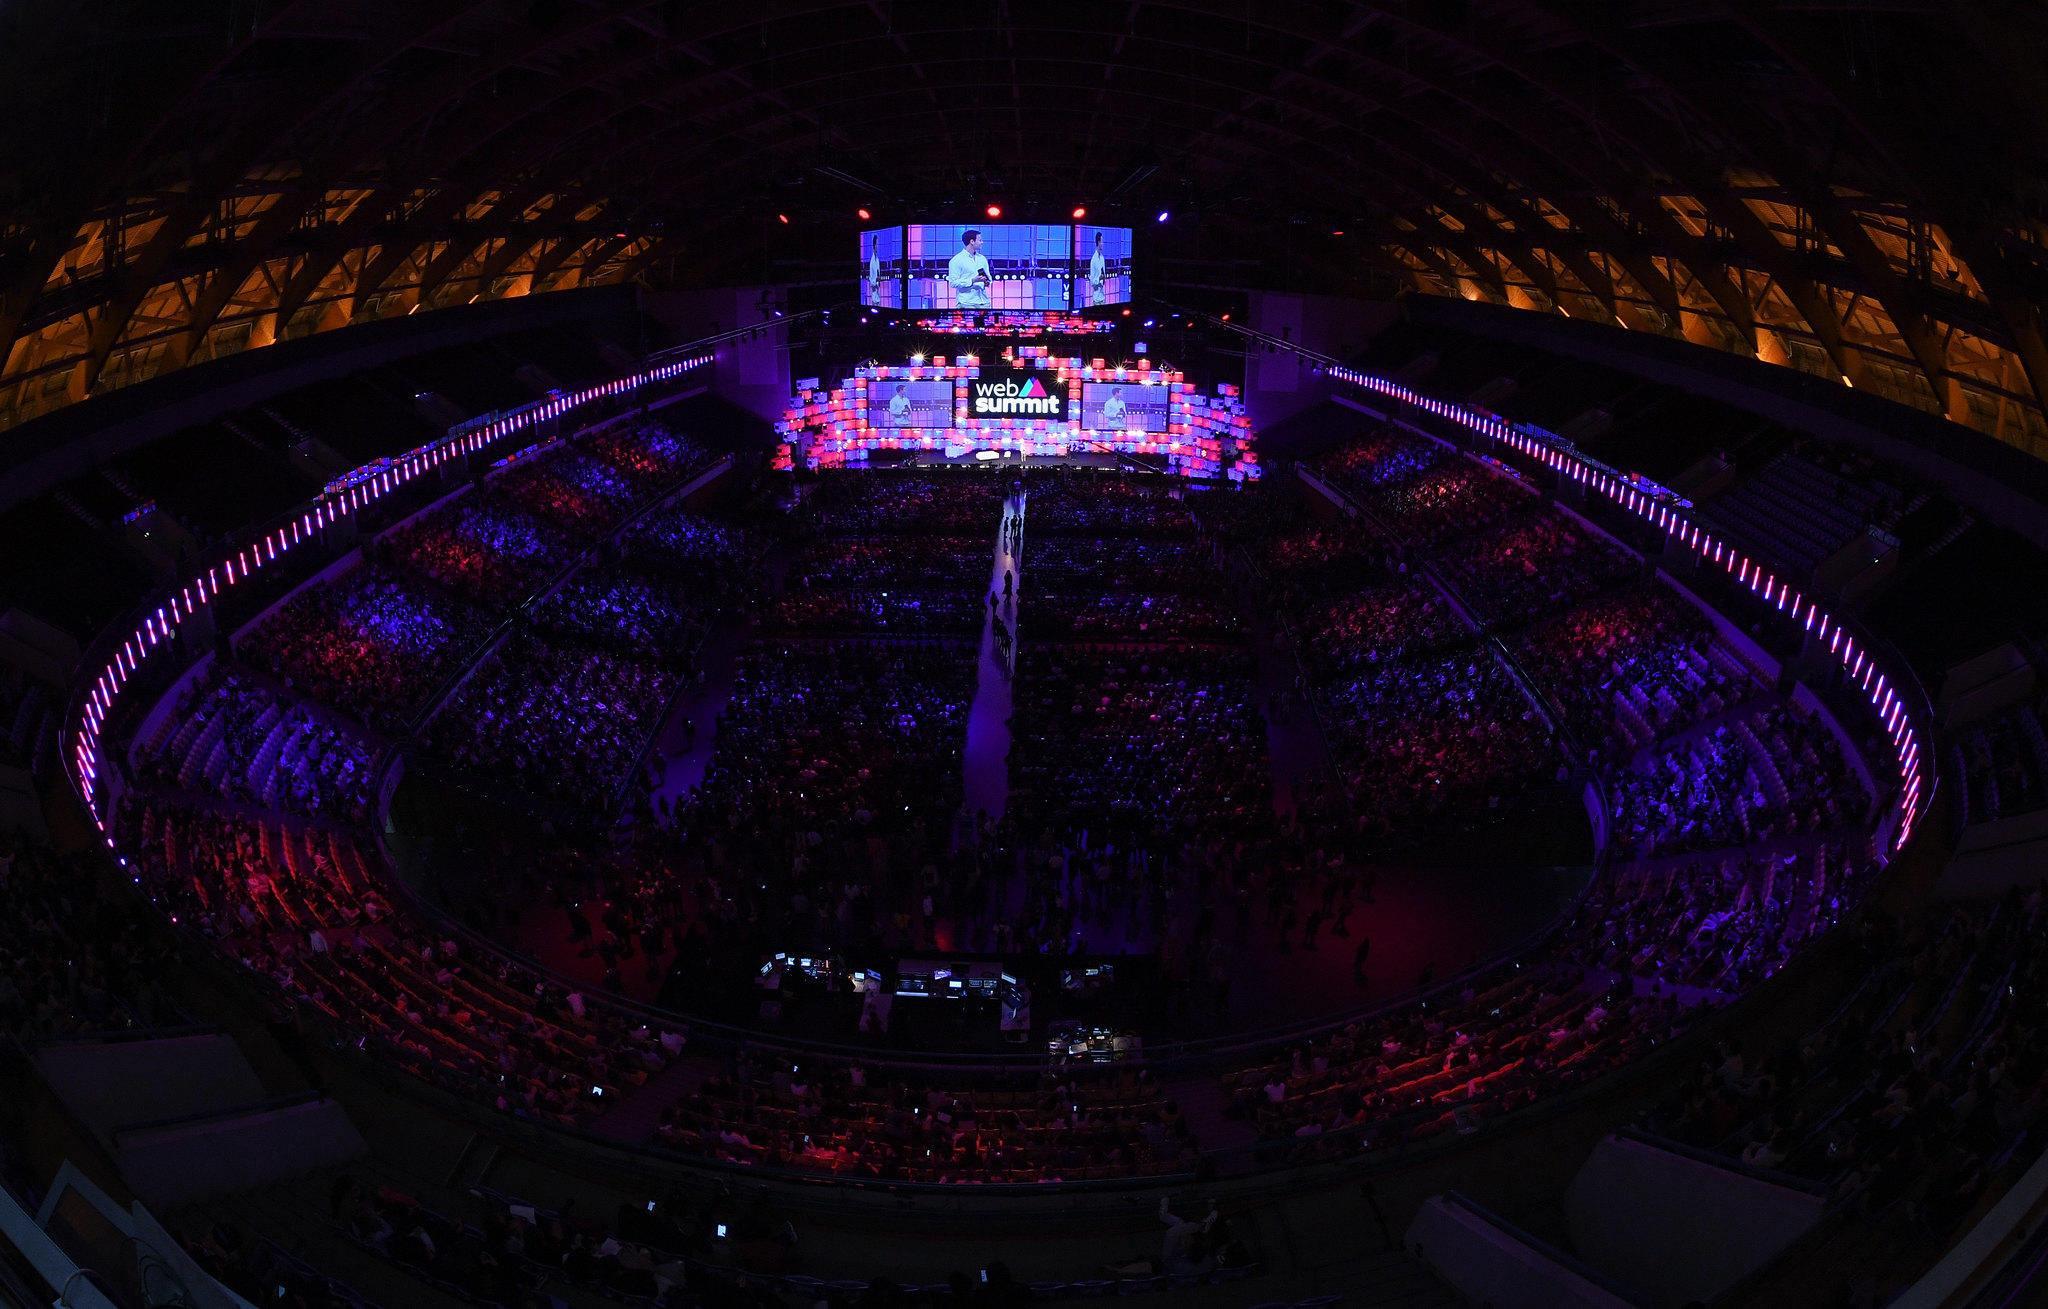 foto aérea do web summit em lisboa